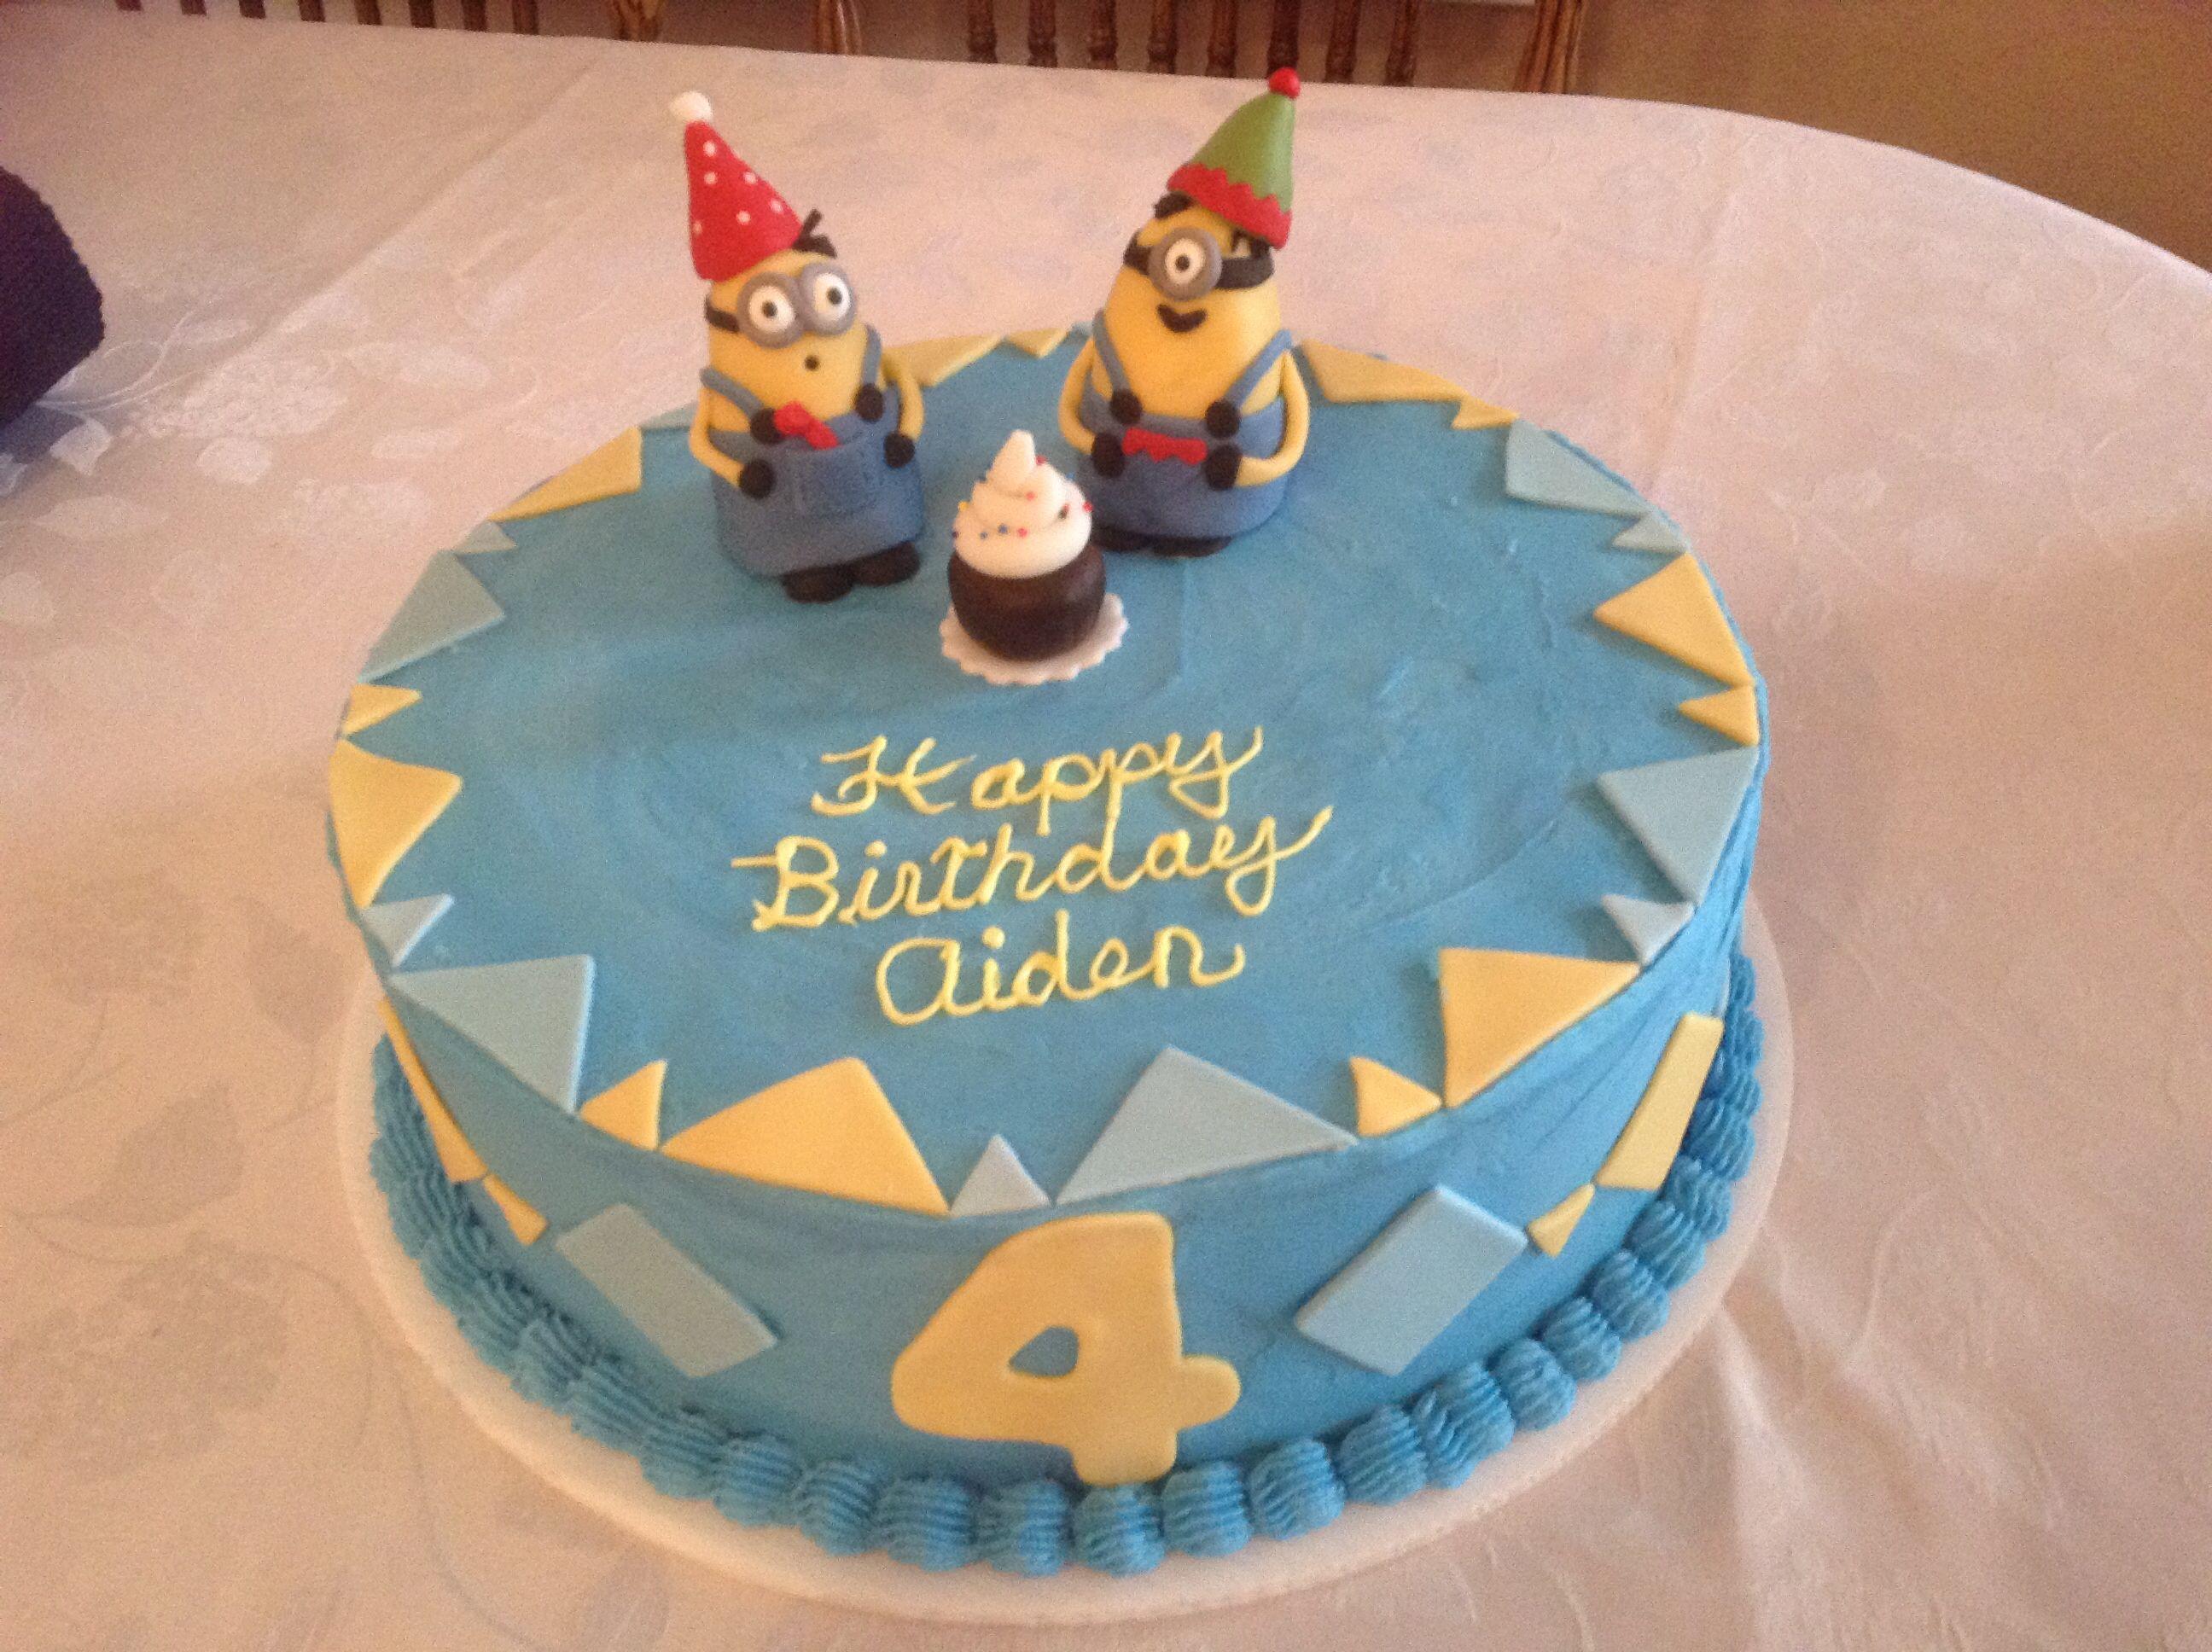 Despicable me cake cake despicable me cake desserts